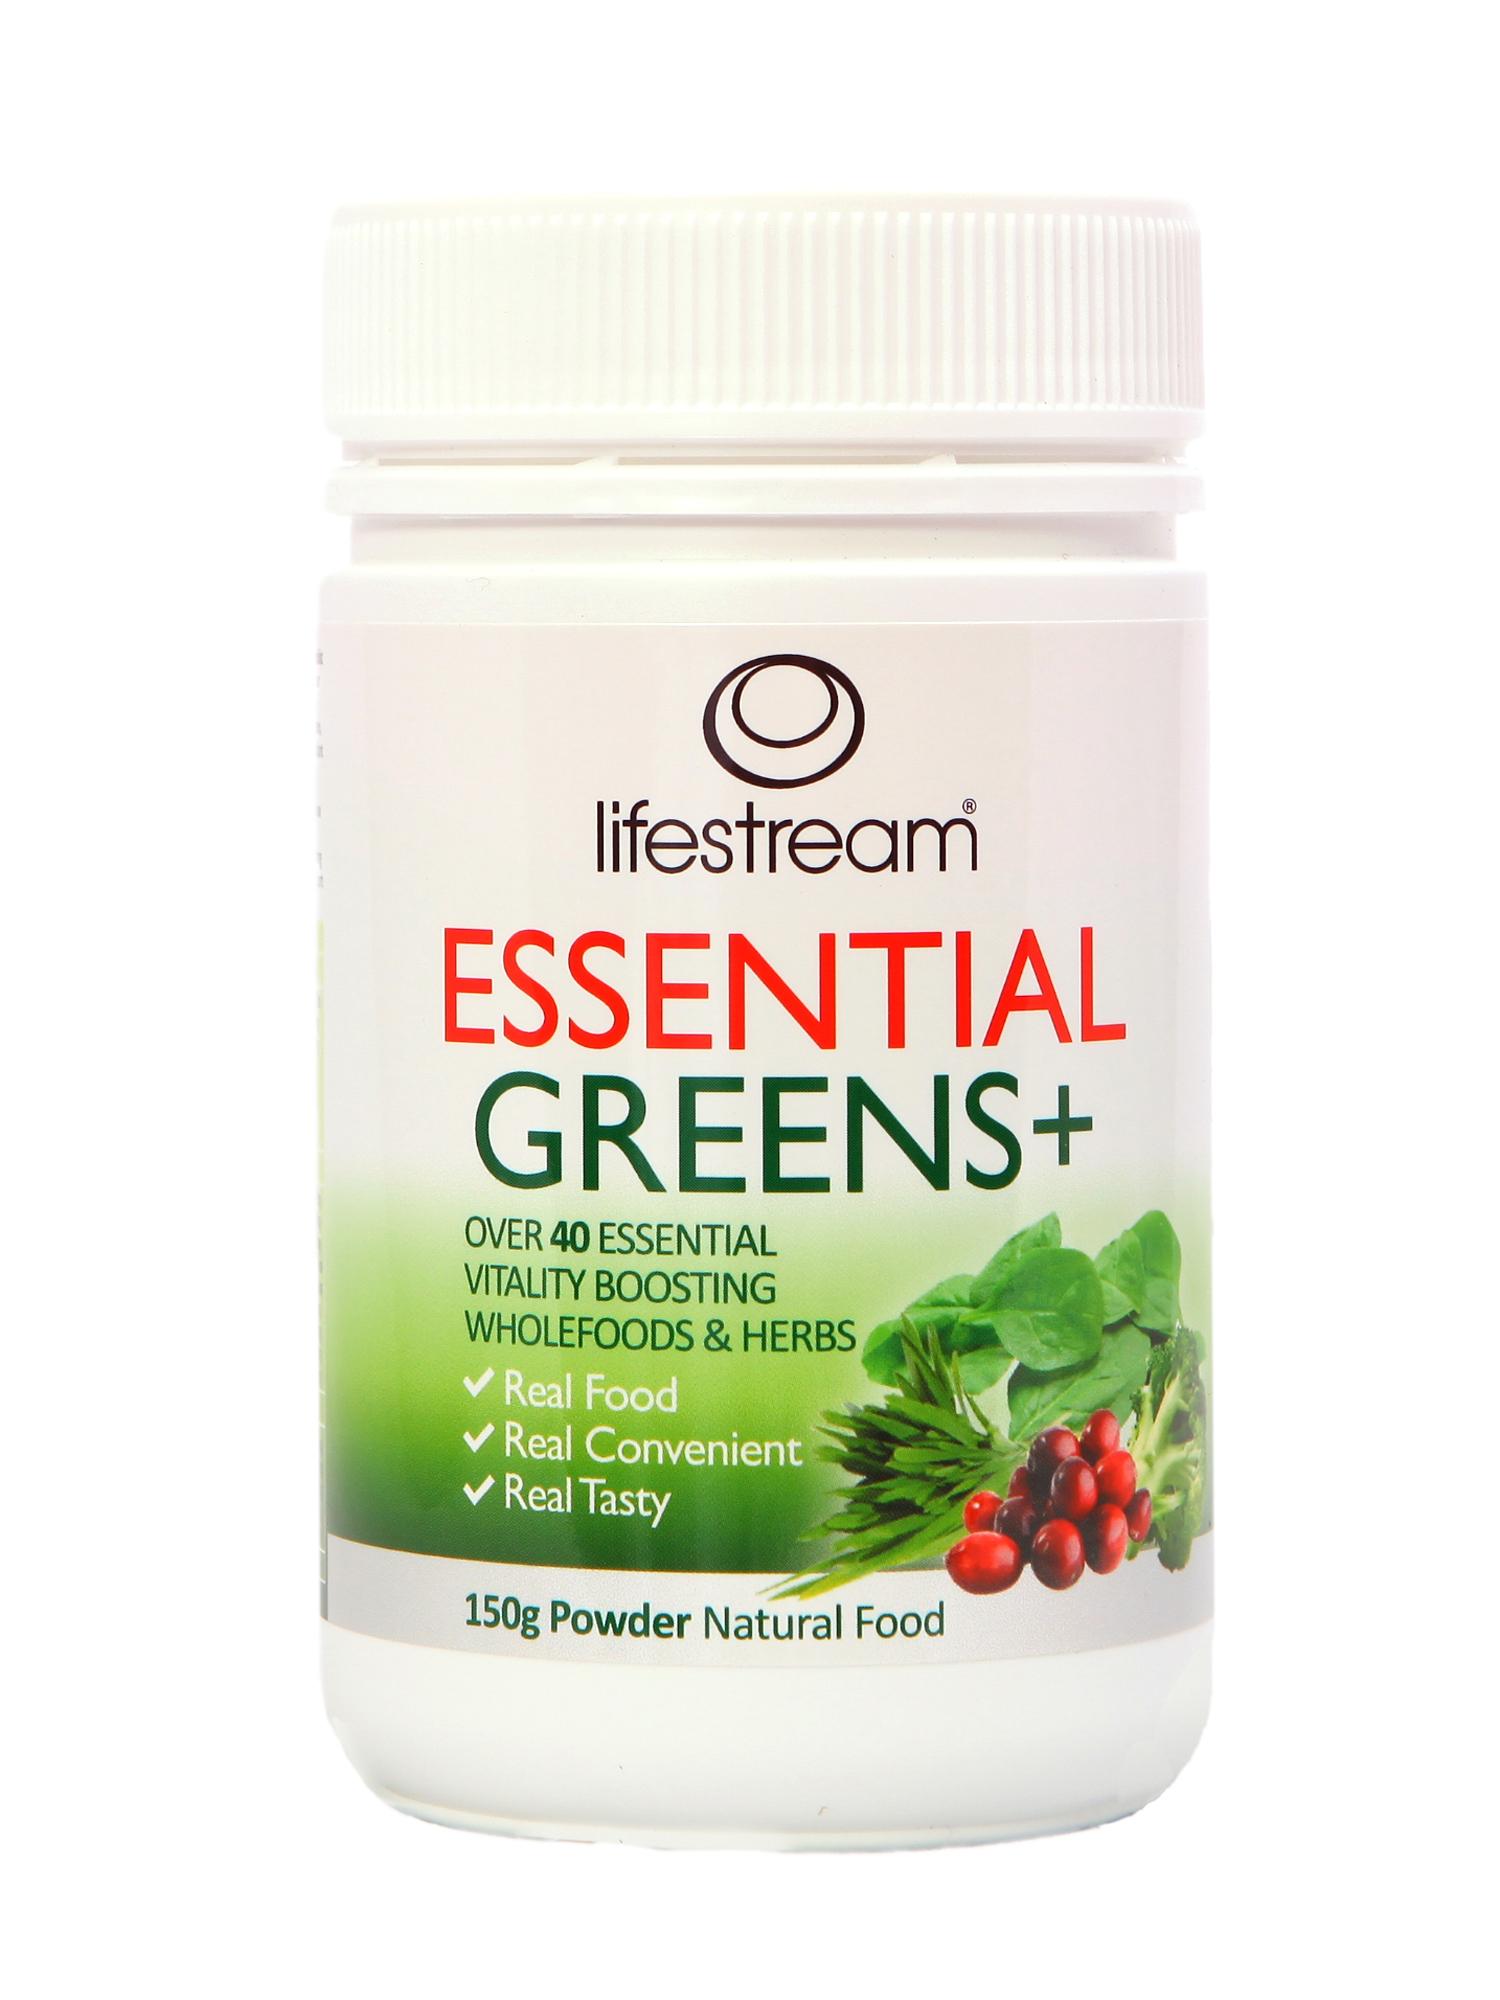 Lifestream_Essential_Greens_Janella-Purcell_Recipe.jpg